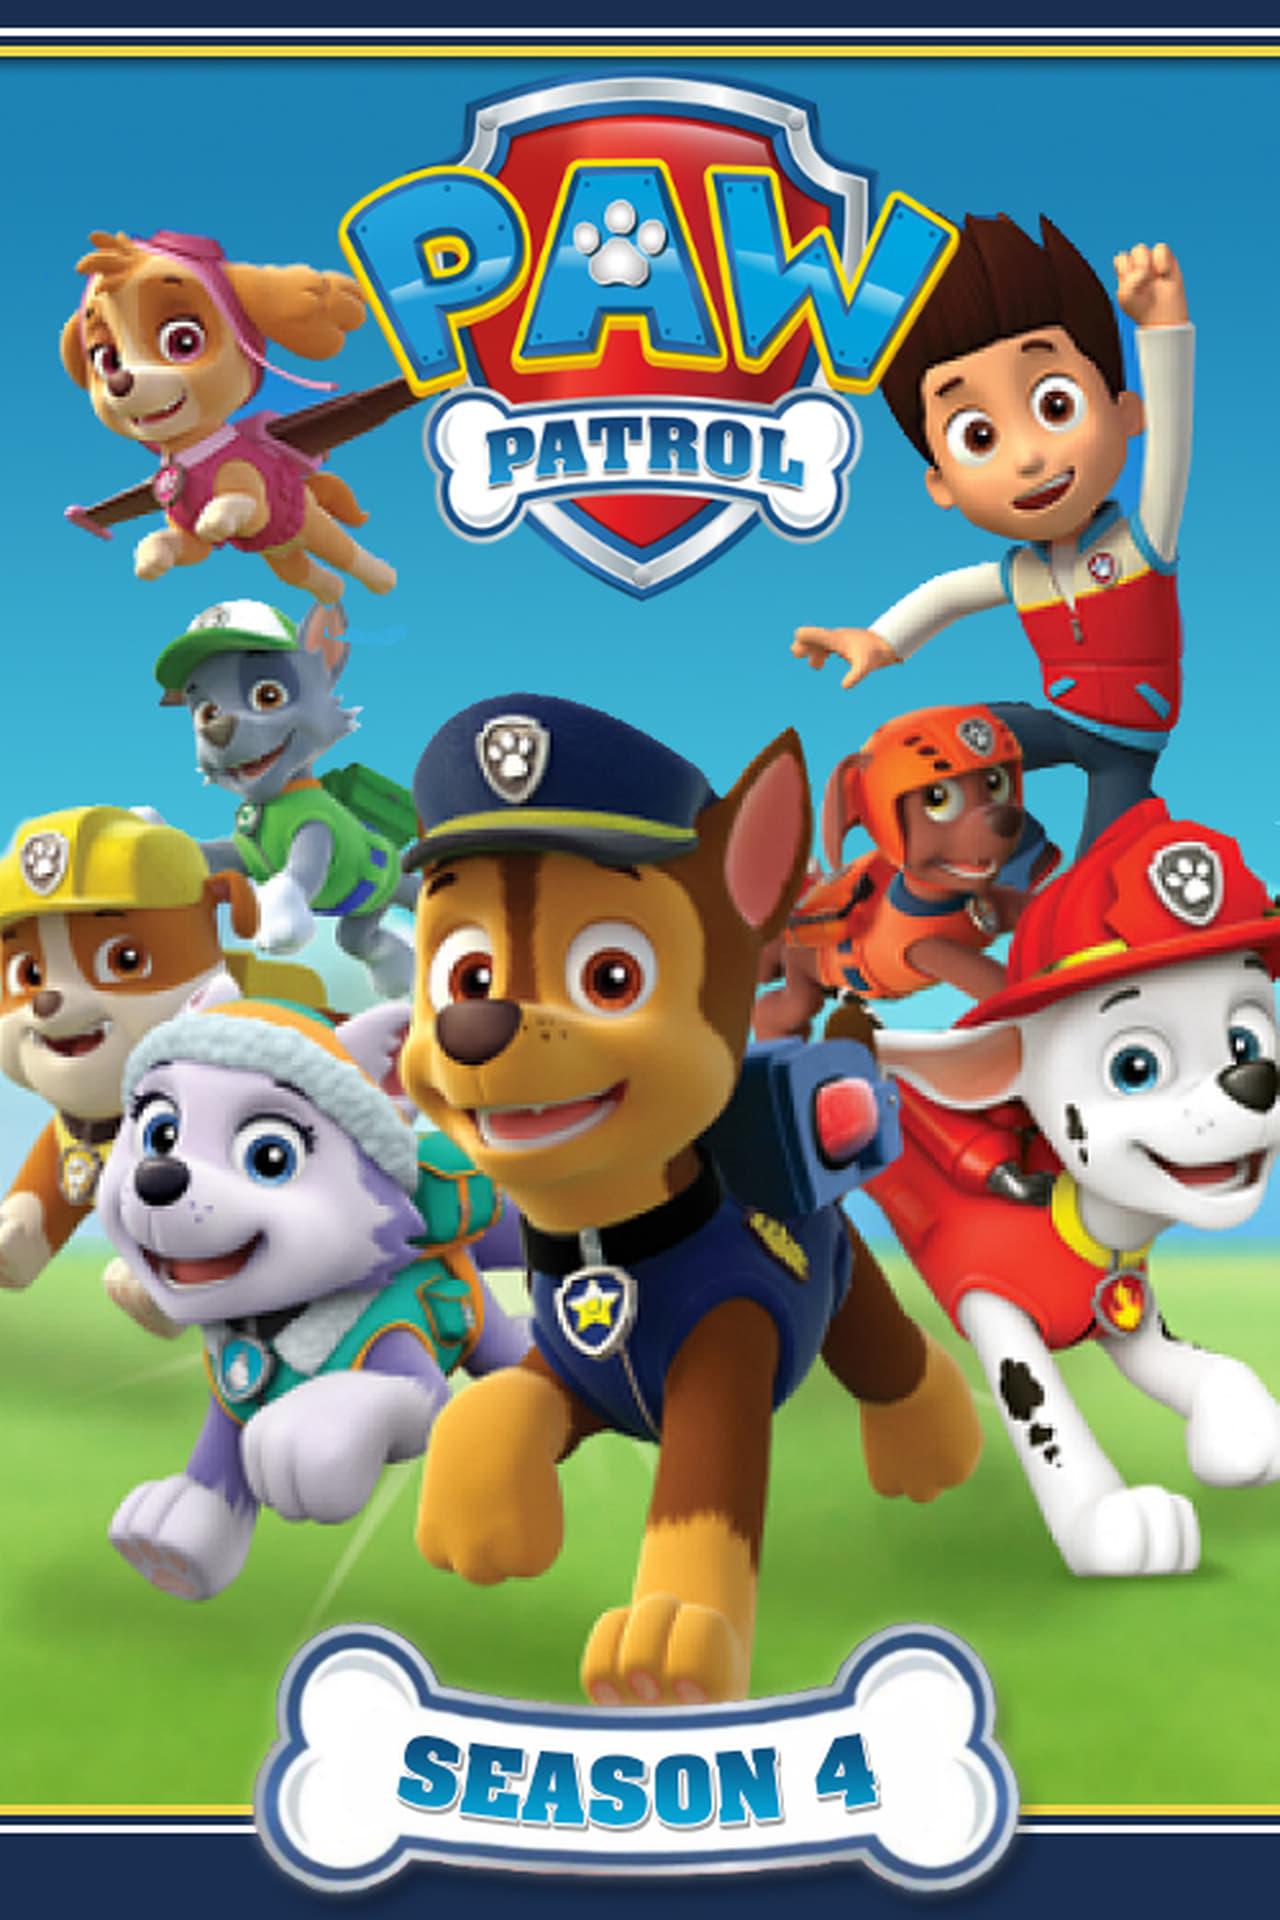 Putlocker Paw Patrol Season 4 (2017)